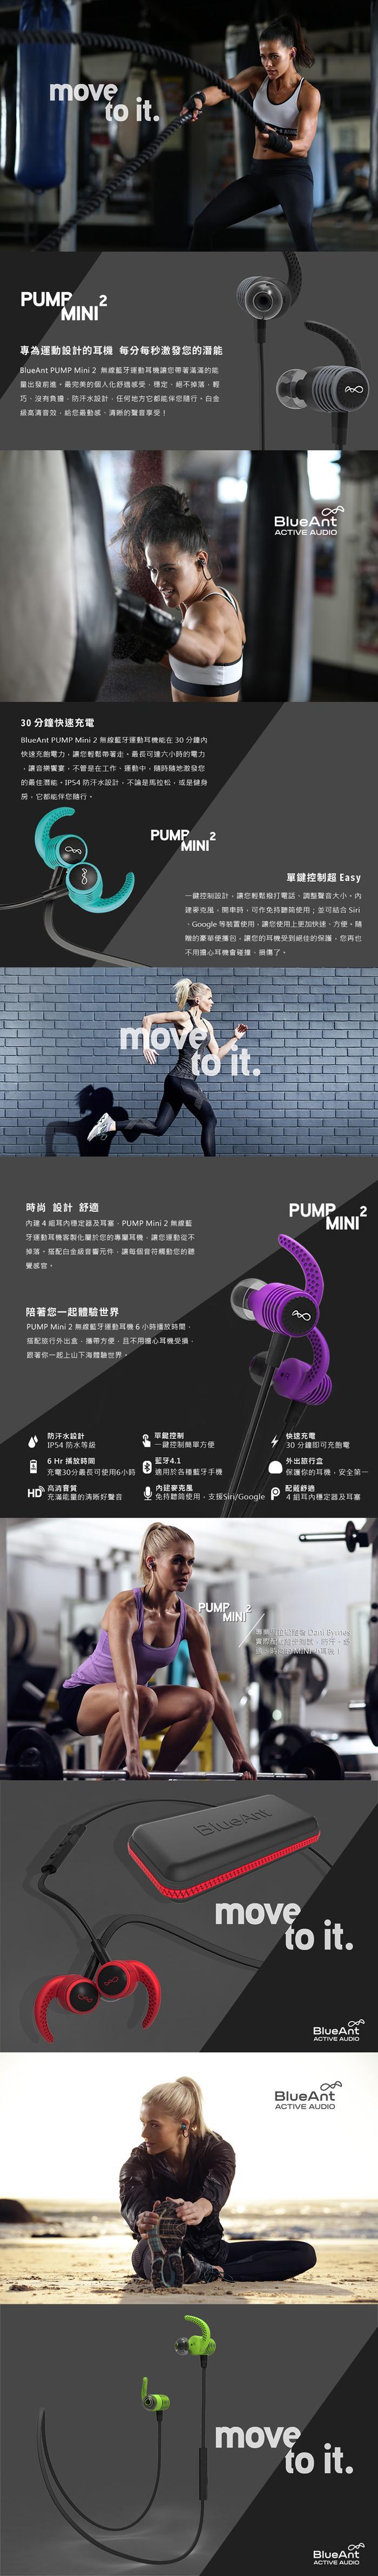 BlueAnt|PUMP MINI 2 藍牙運動耳機